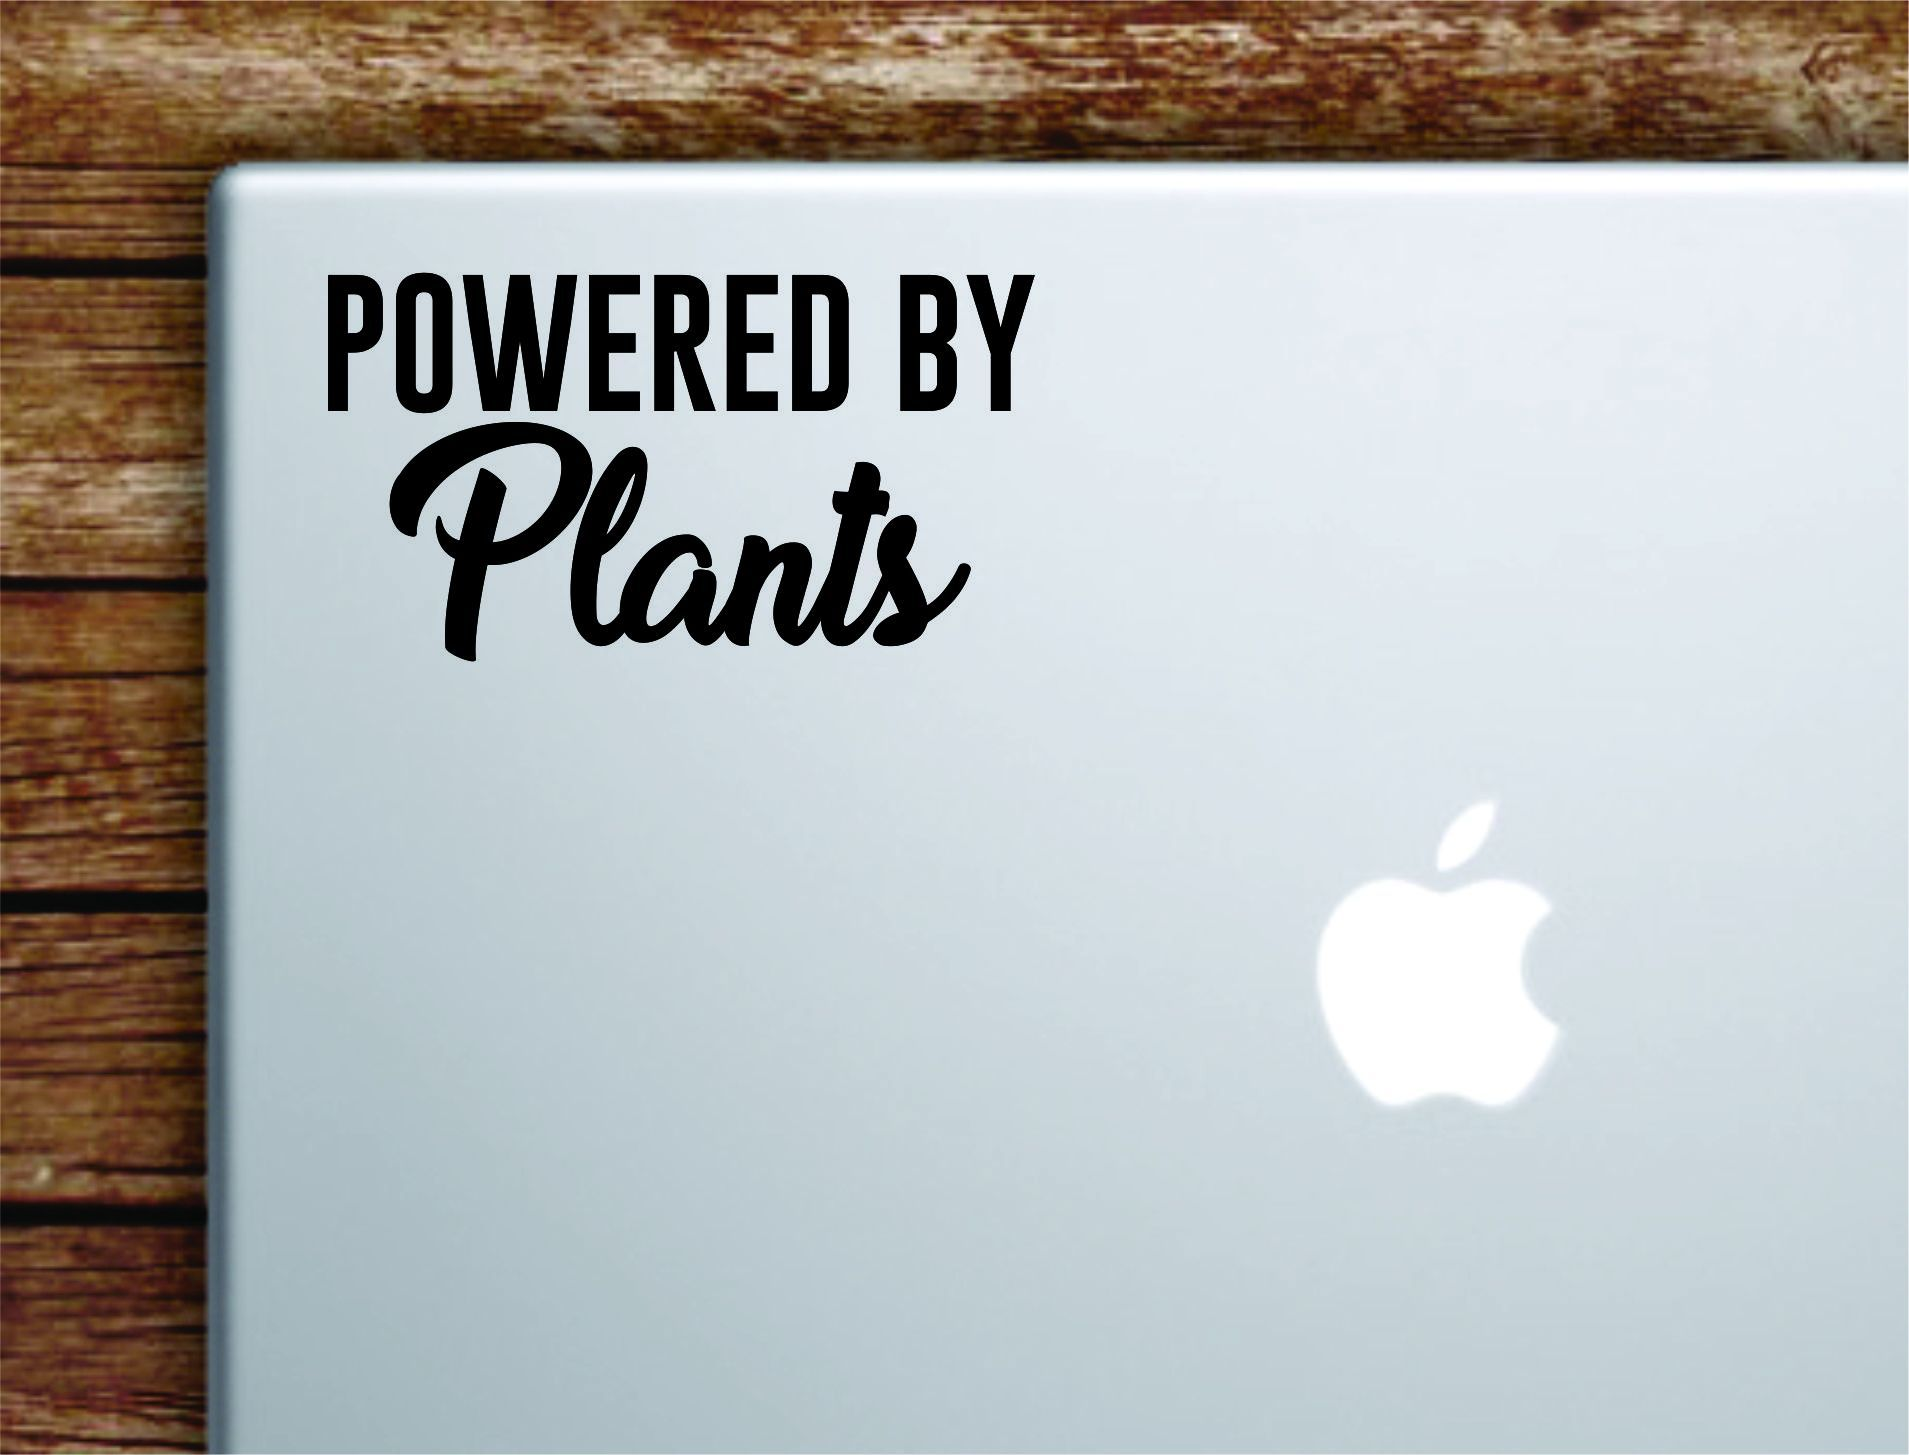 Powered By Plants Laptop Wall Decal Sticker Vinyl Art Quote Macbook Apple Decor Car Window Truck Teen Inspirational Girls Vegan Healthy - vivid blue